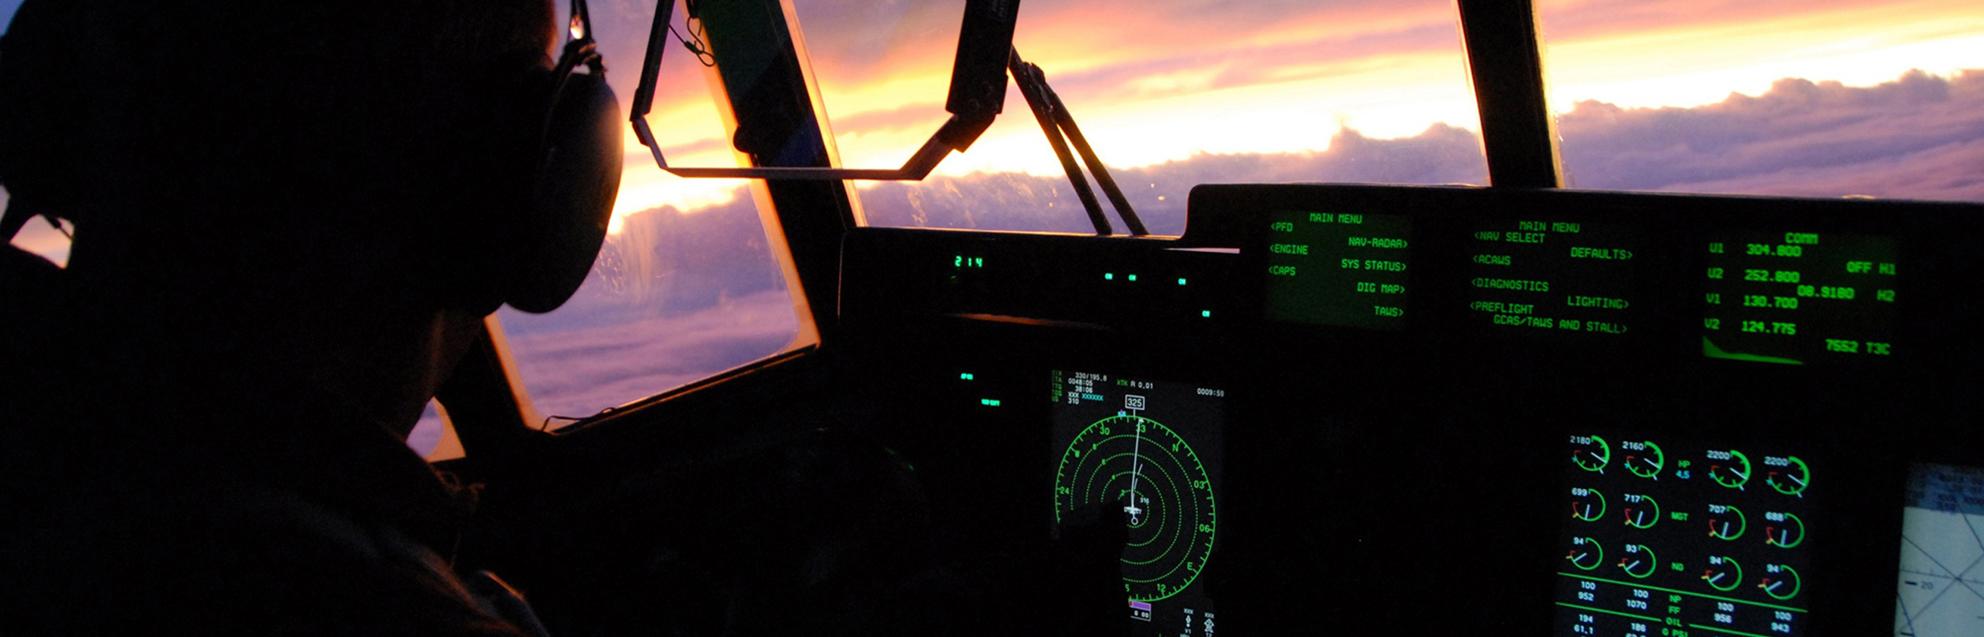 sunset_sky_clouds.jpg